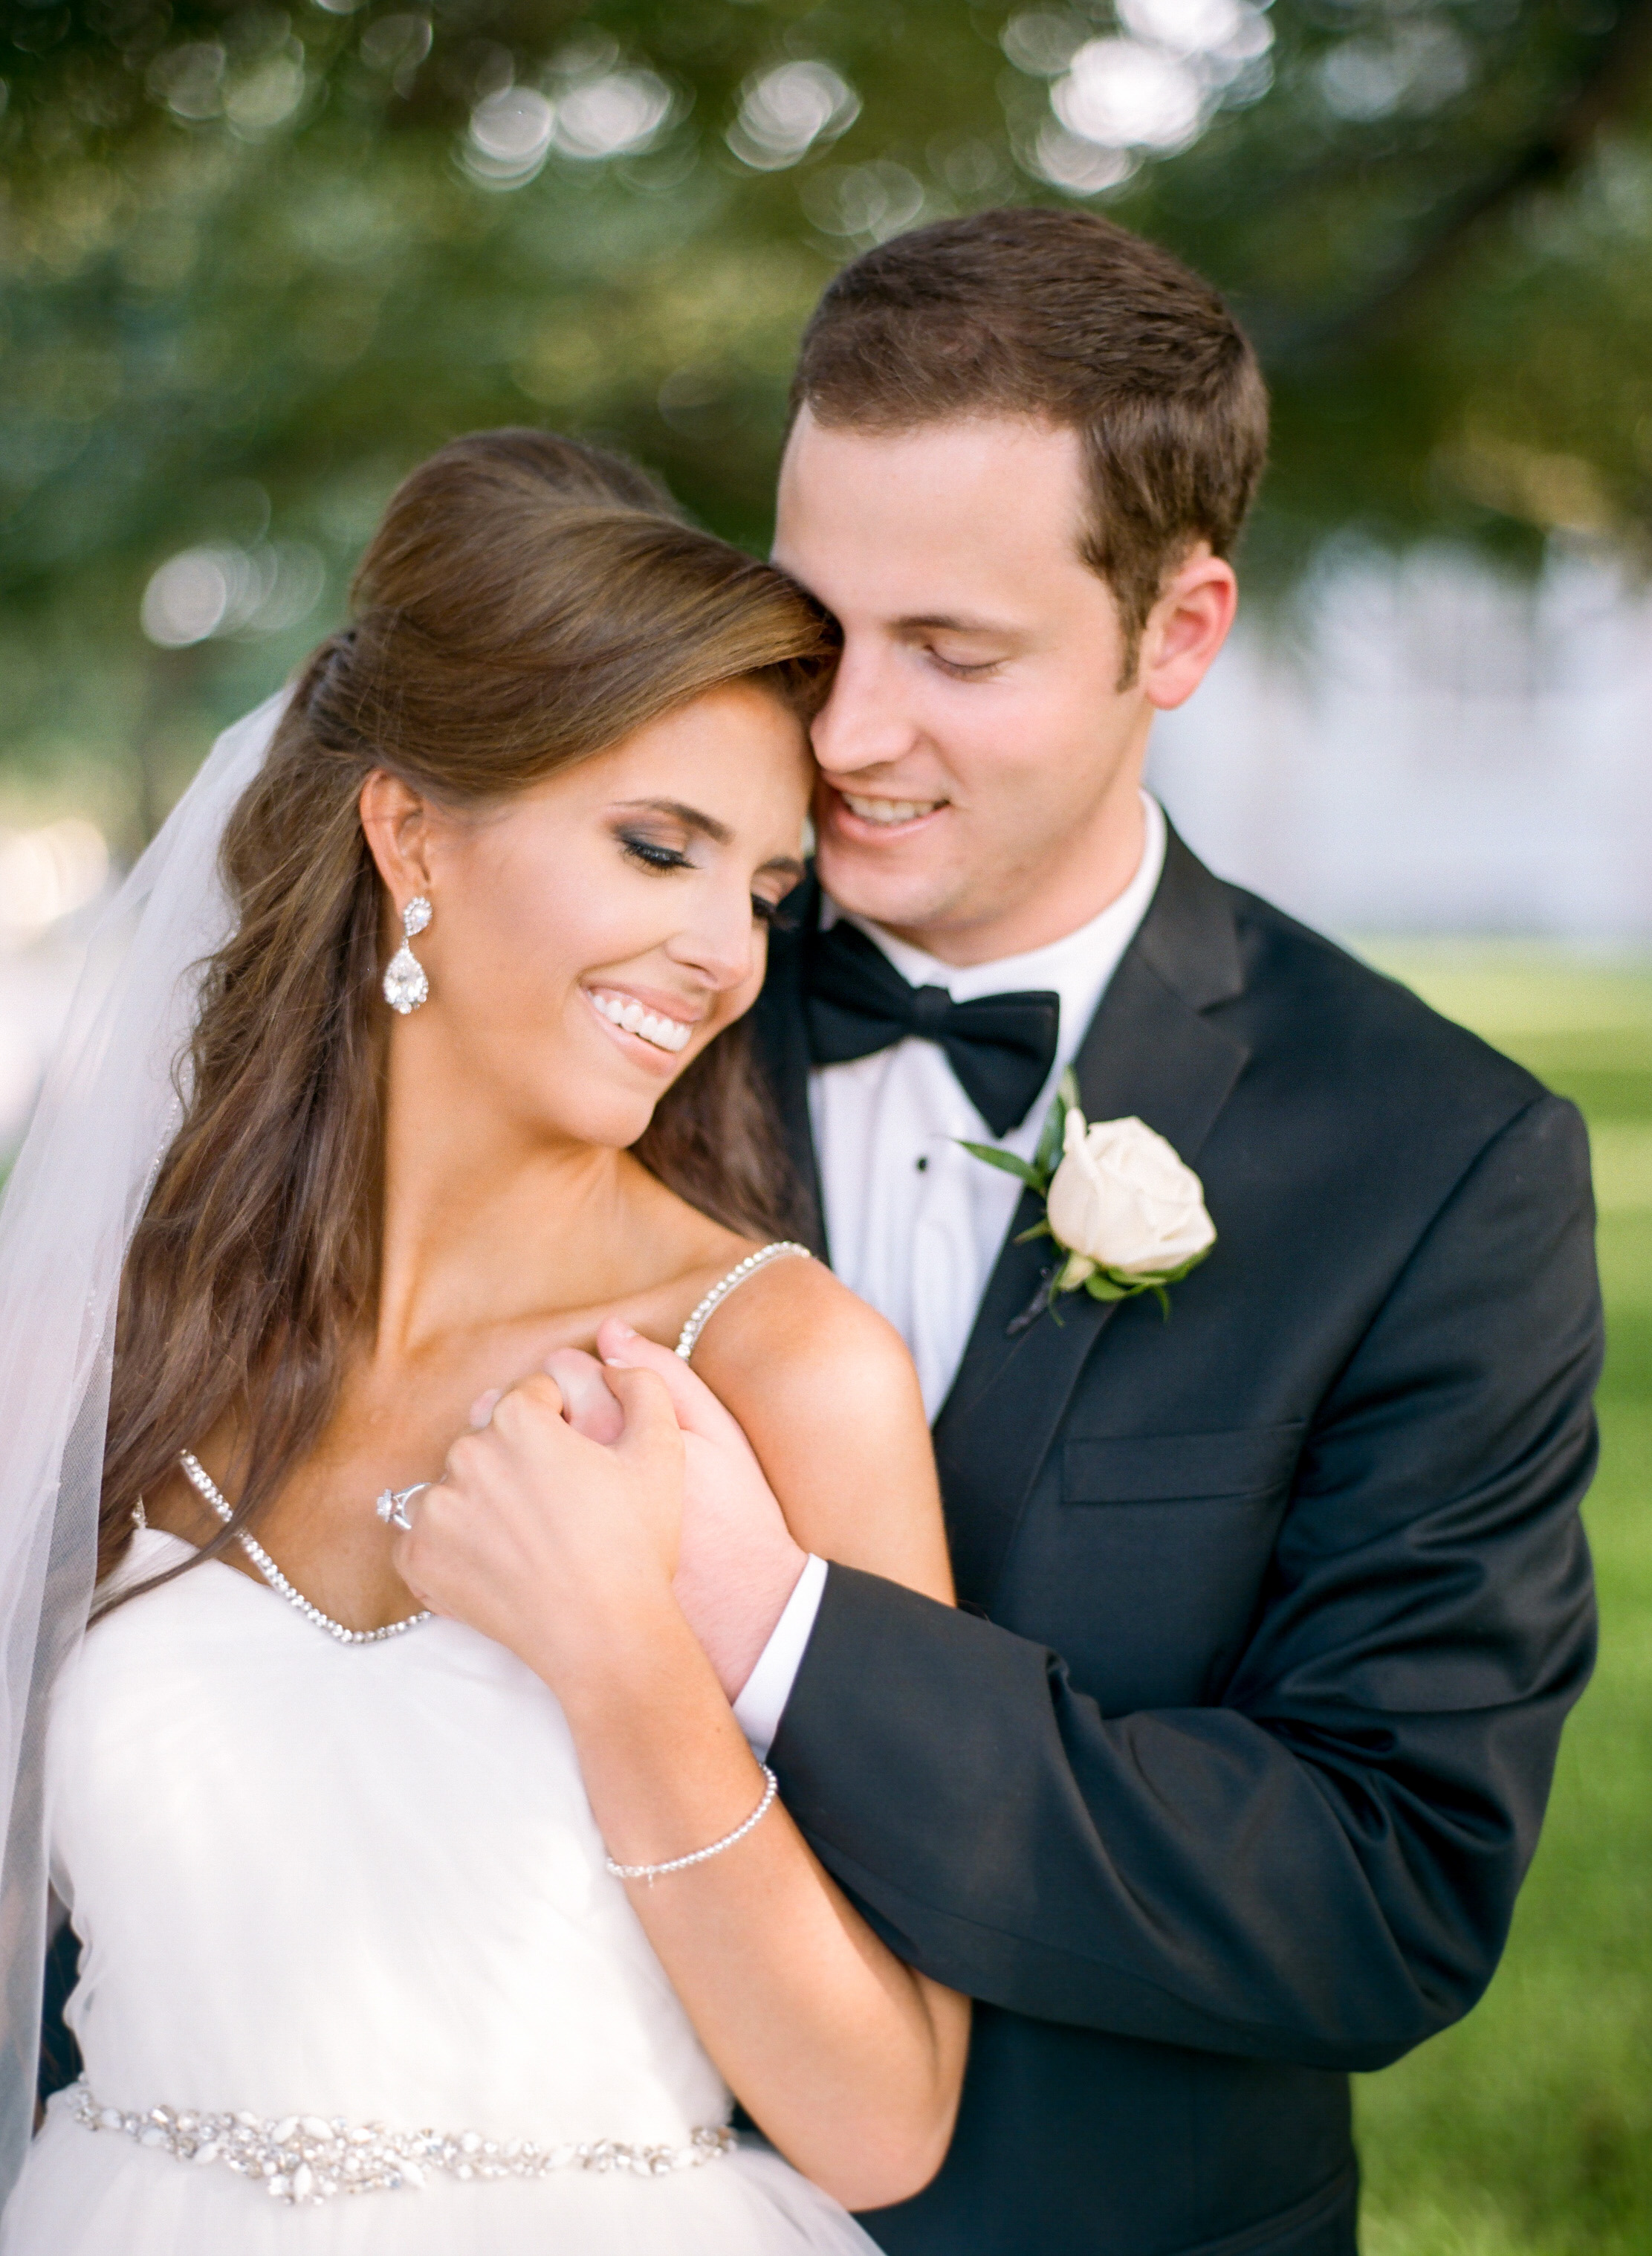 Dana-Fernandez-Photography-Weddings-in-Houston-Magazine-feature-Houston-wedding-photographer-film-28.jpg